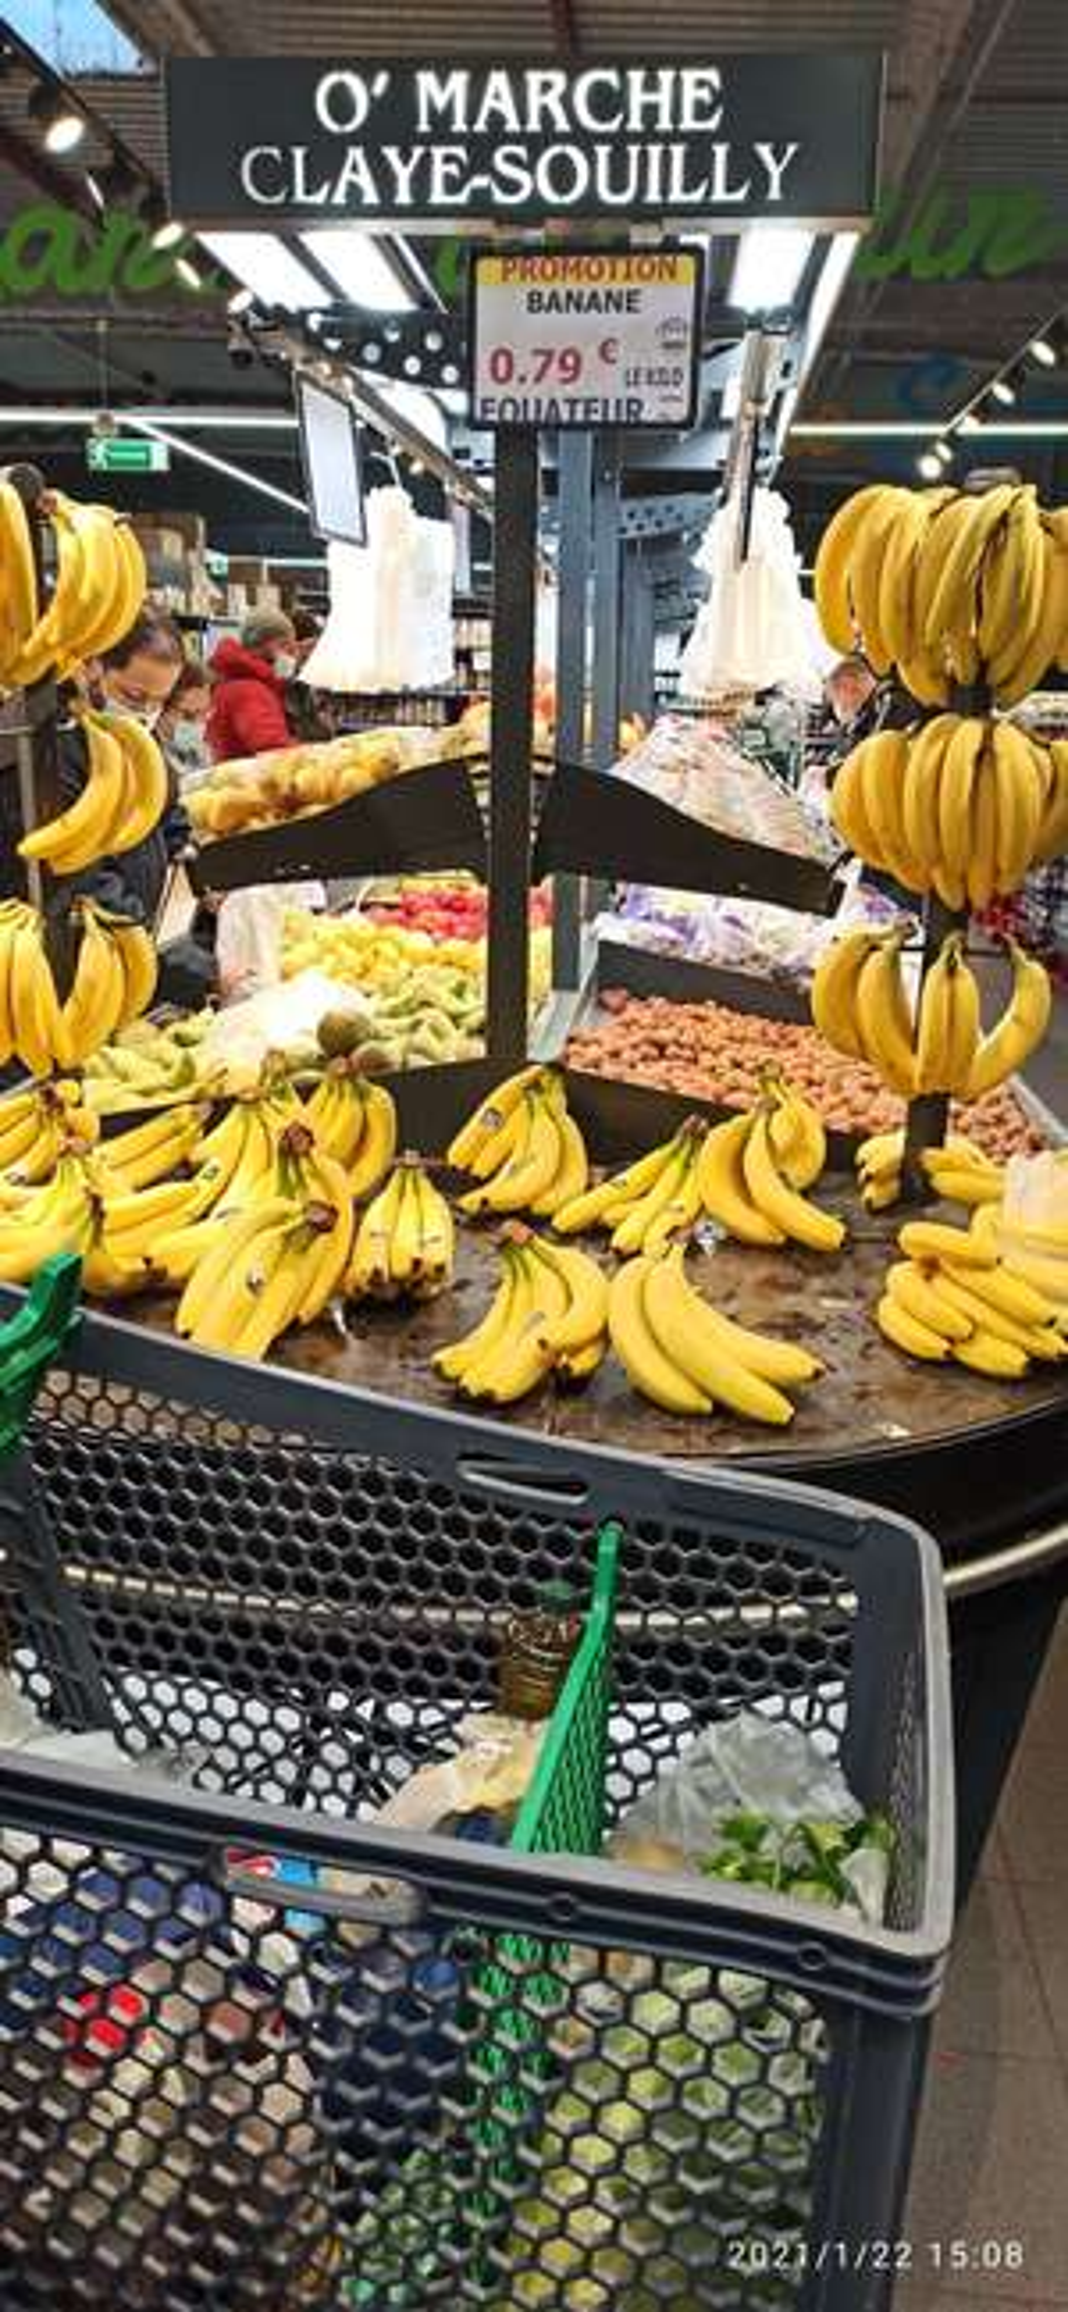 Banane origine Équateur - O' marche Claye Souilly (77)